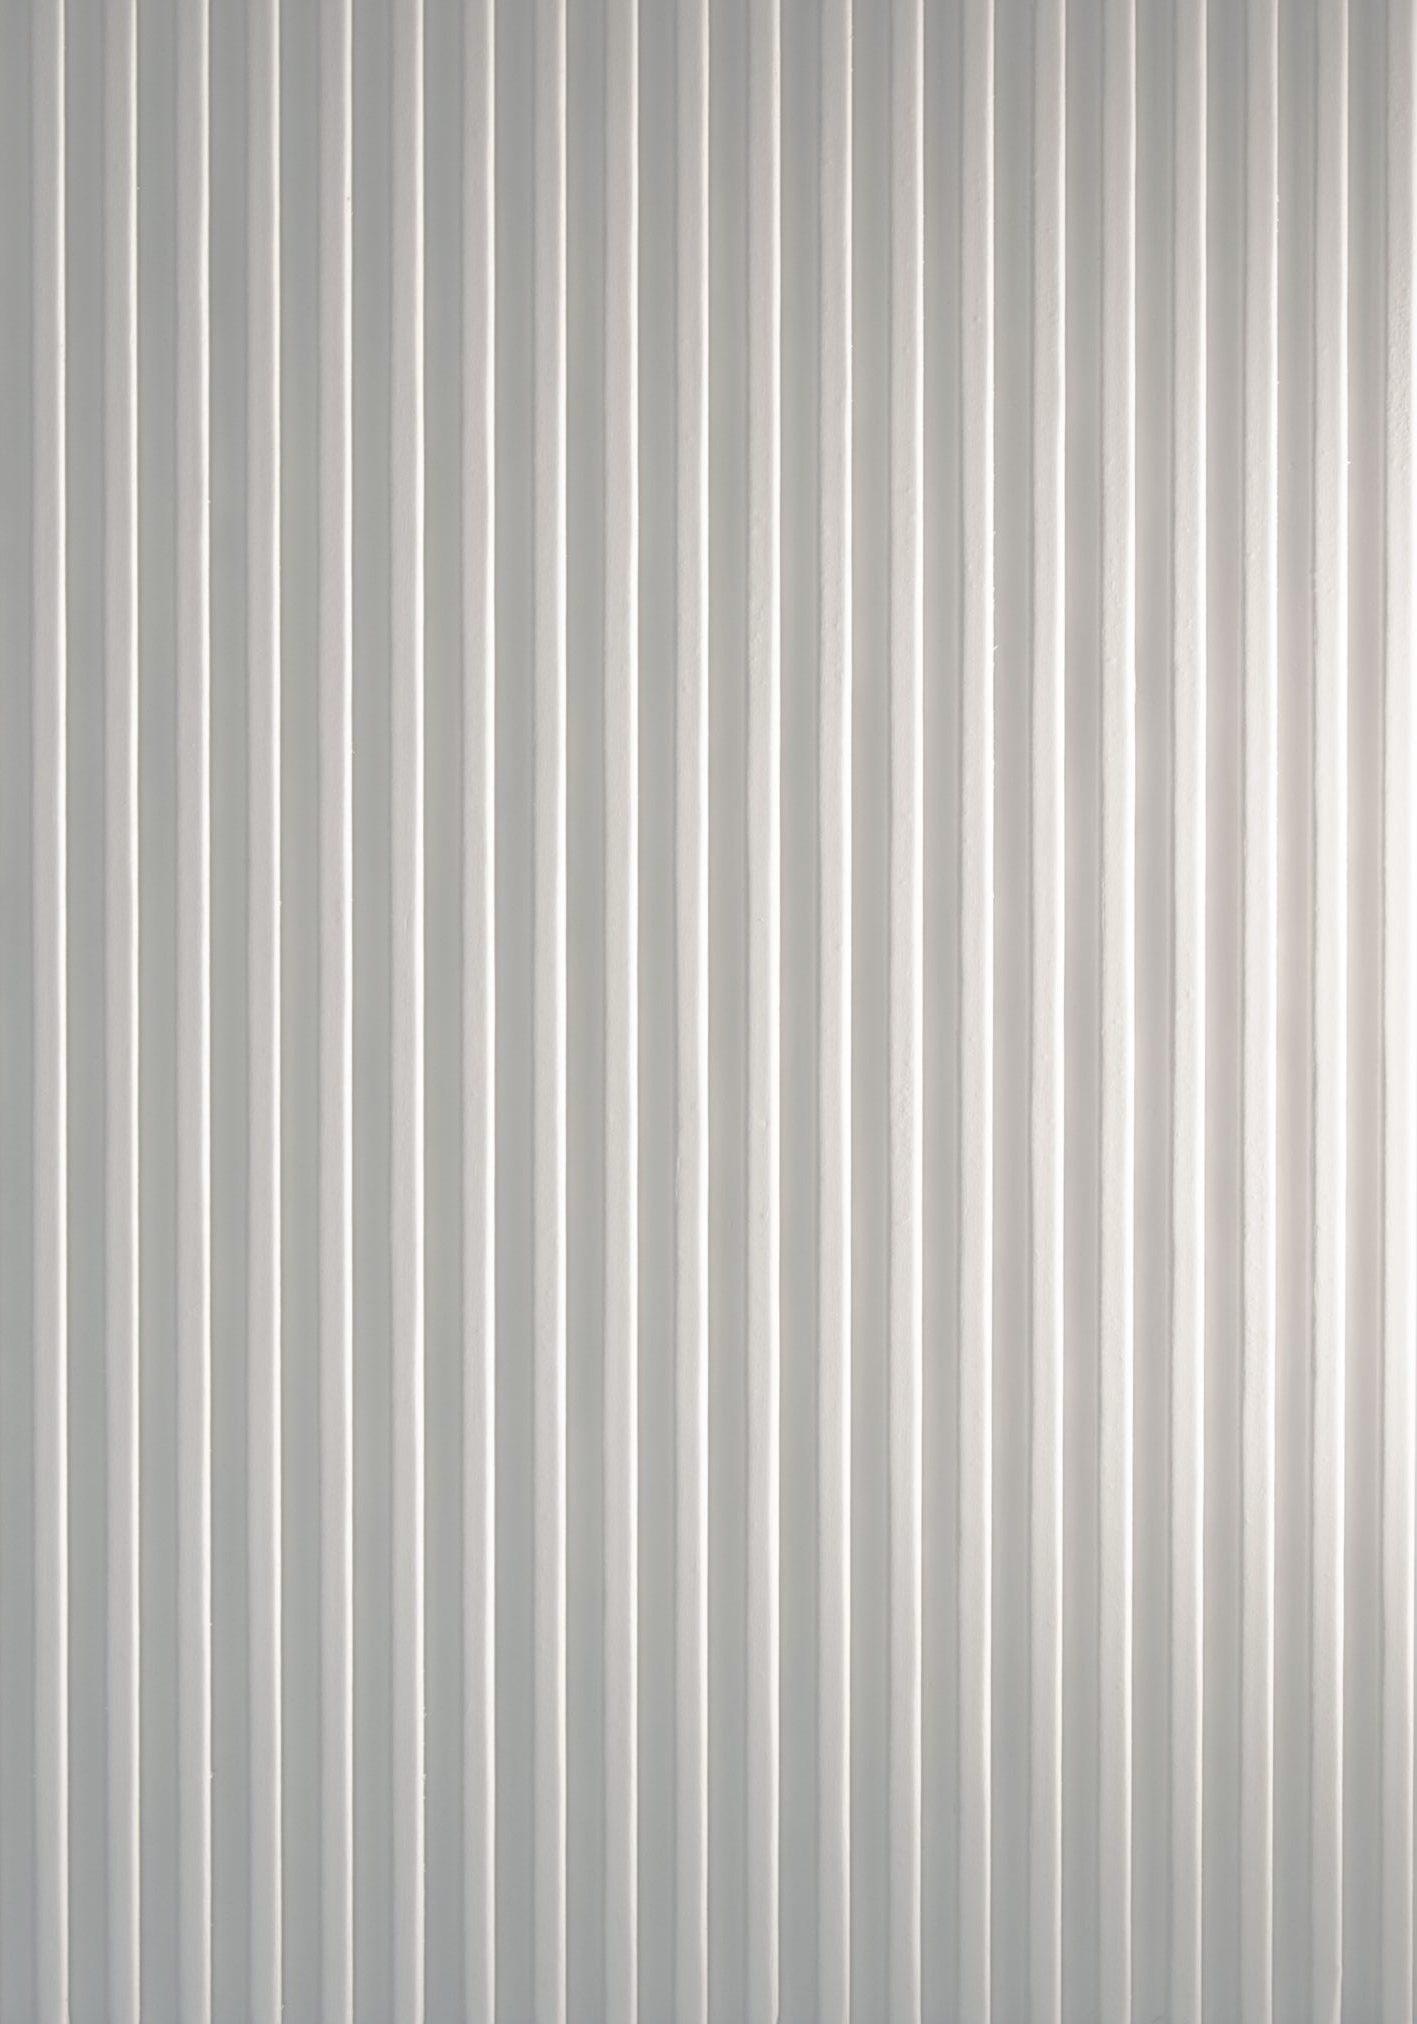 2609 - BAR - White - Alpi veneer